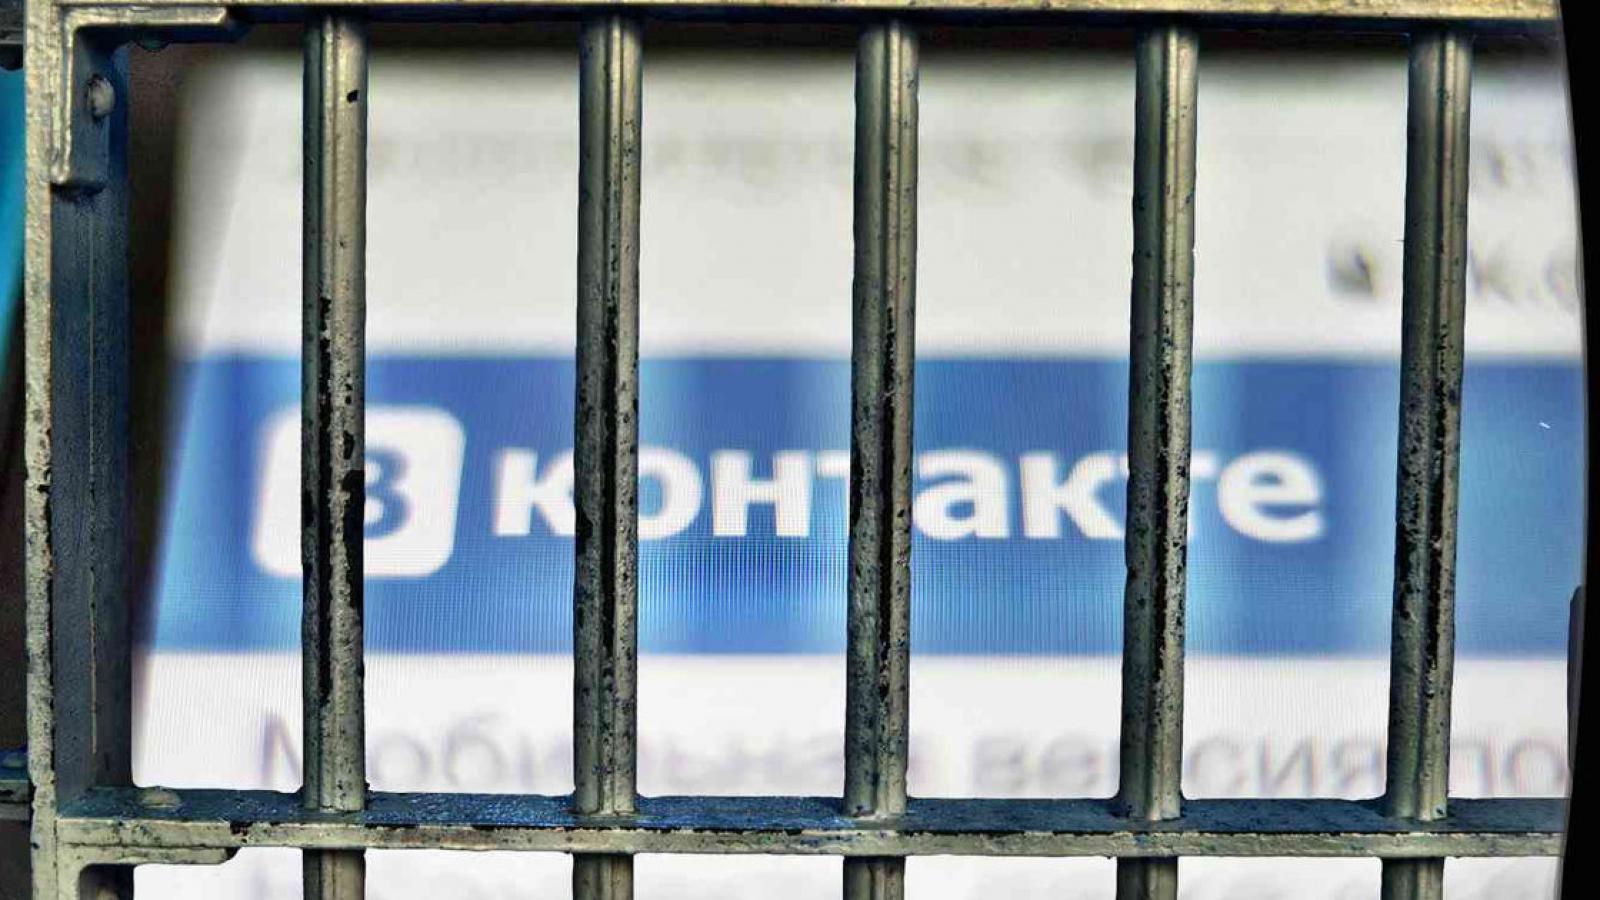 В Грязовце осужден интернет-экстремист